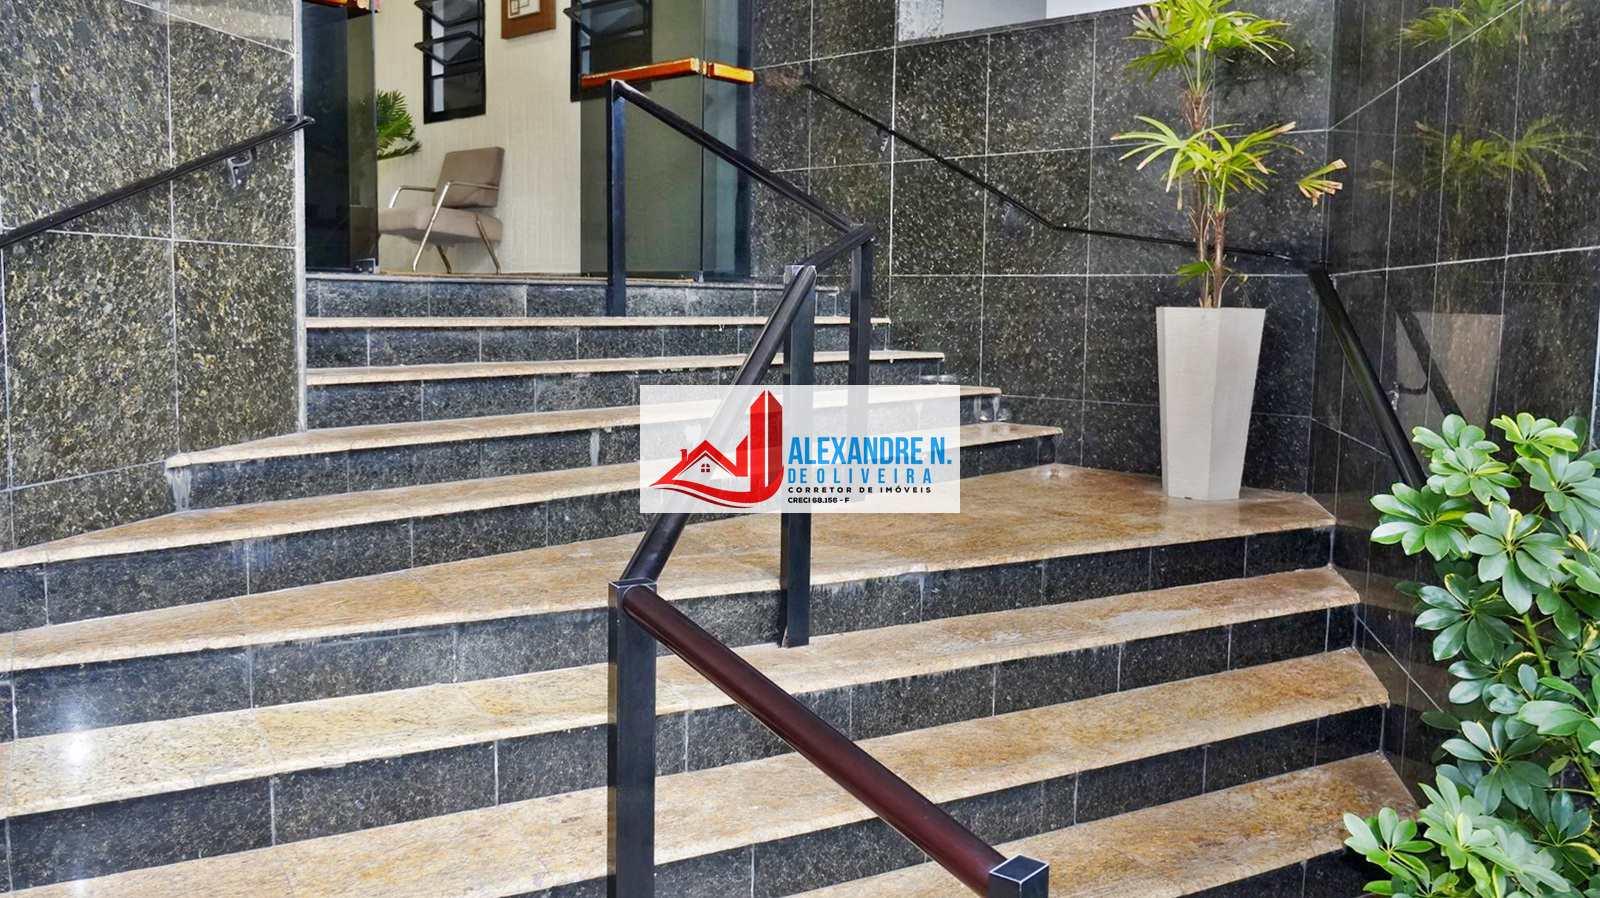 Apto 2 dorms, Ocian, Praia Grande, Entr. R$ 75 mil, AP00450